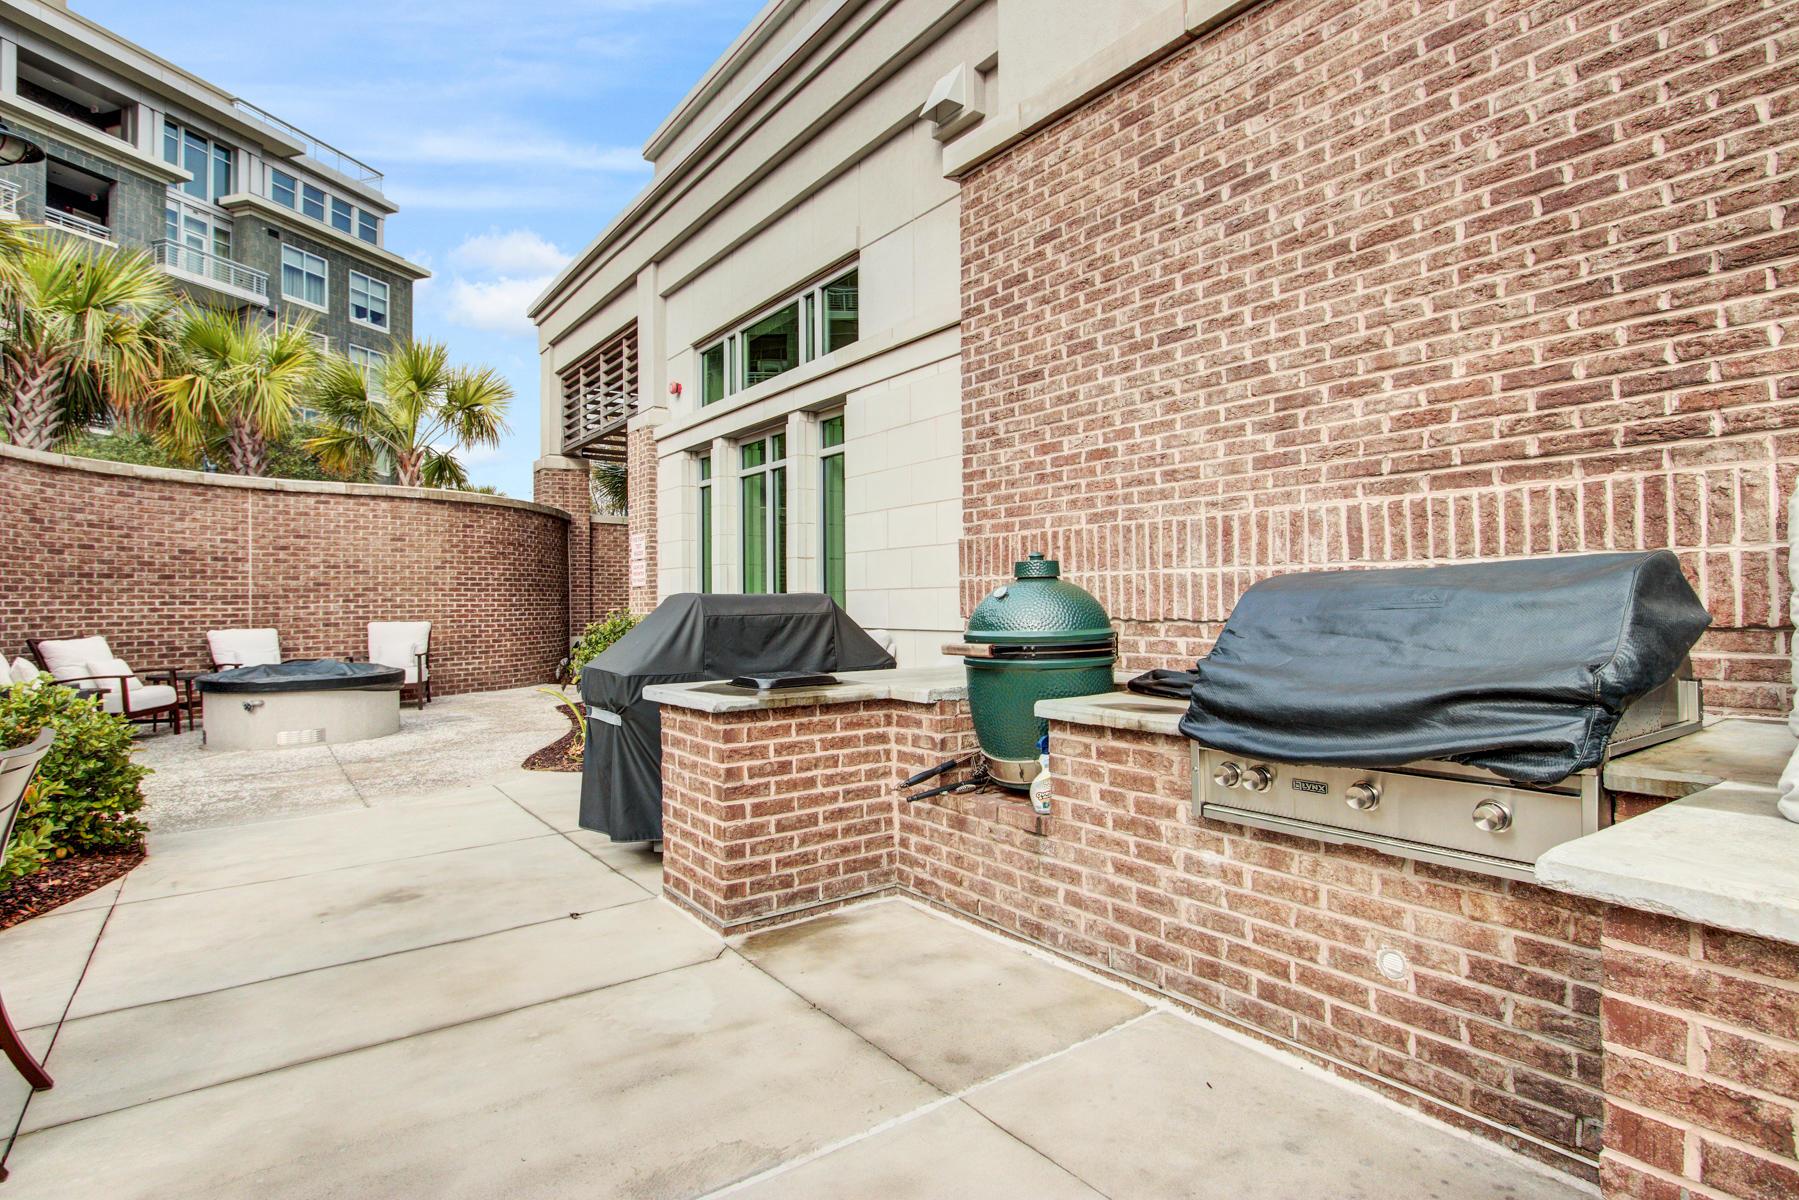 Tides IV Condominiums Homes For Sale - 155 Wingo, Mount Pleasant, SC - 15